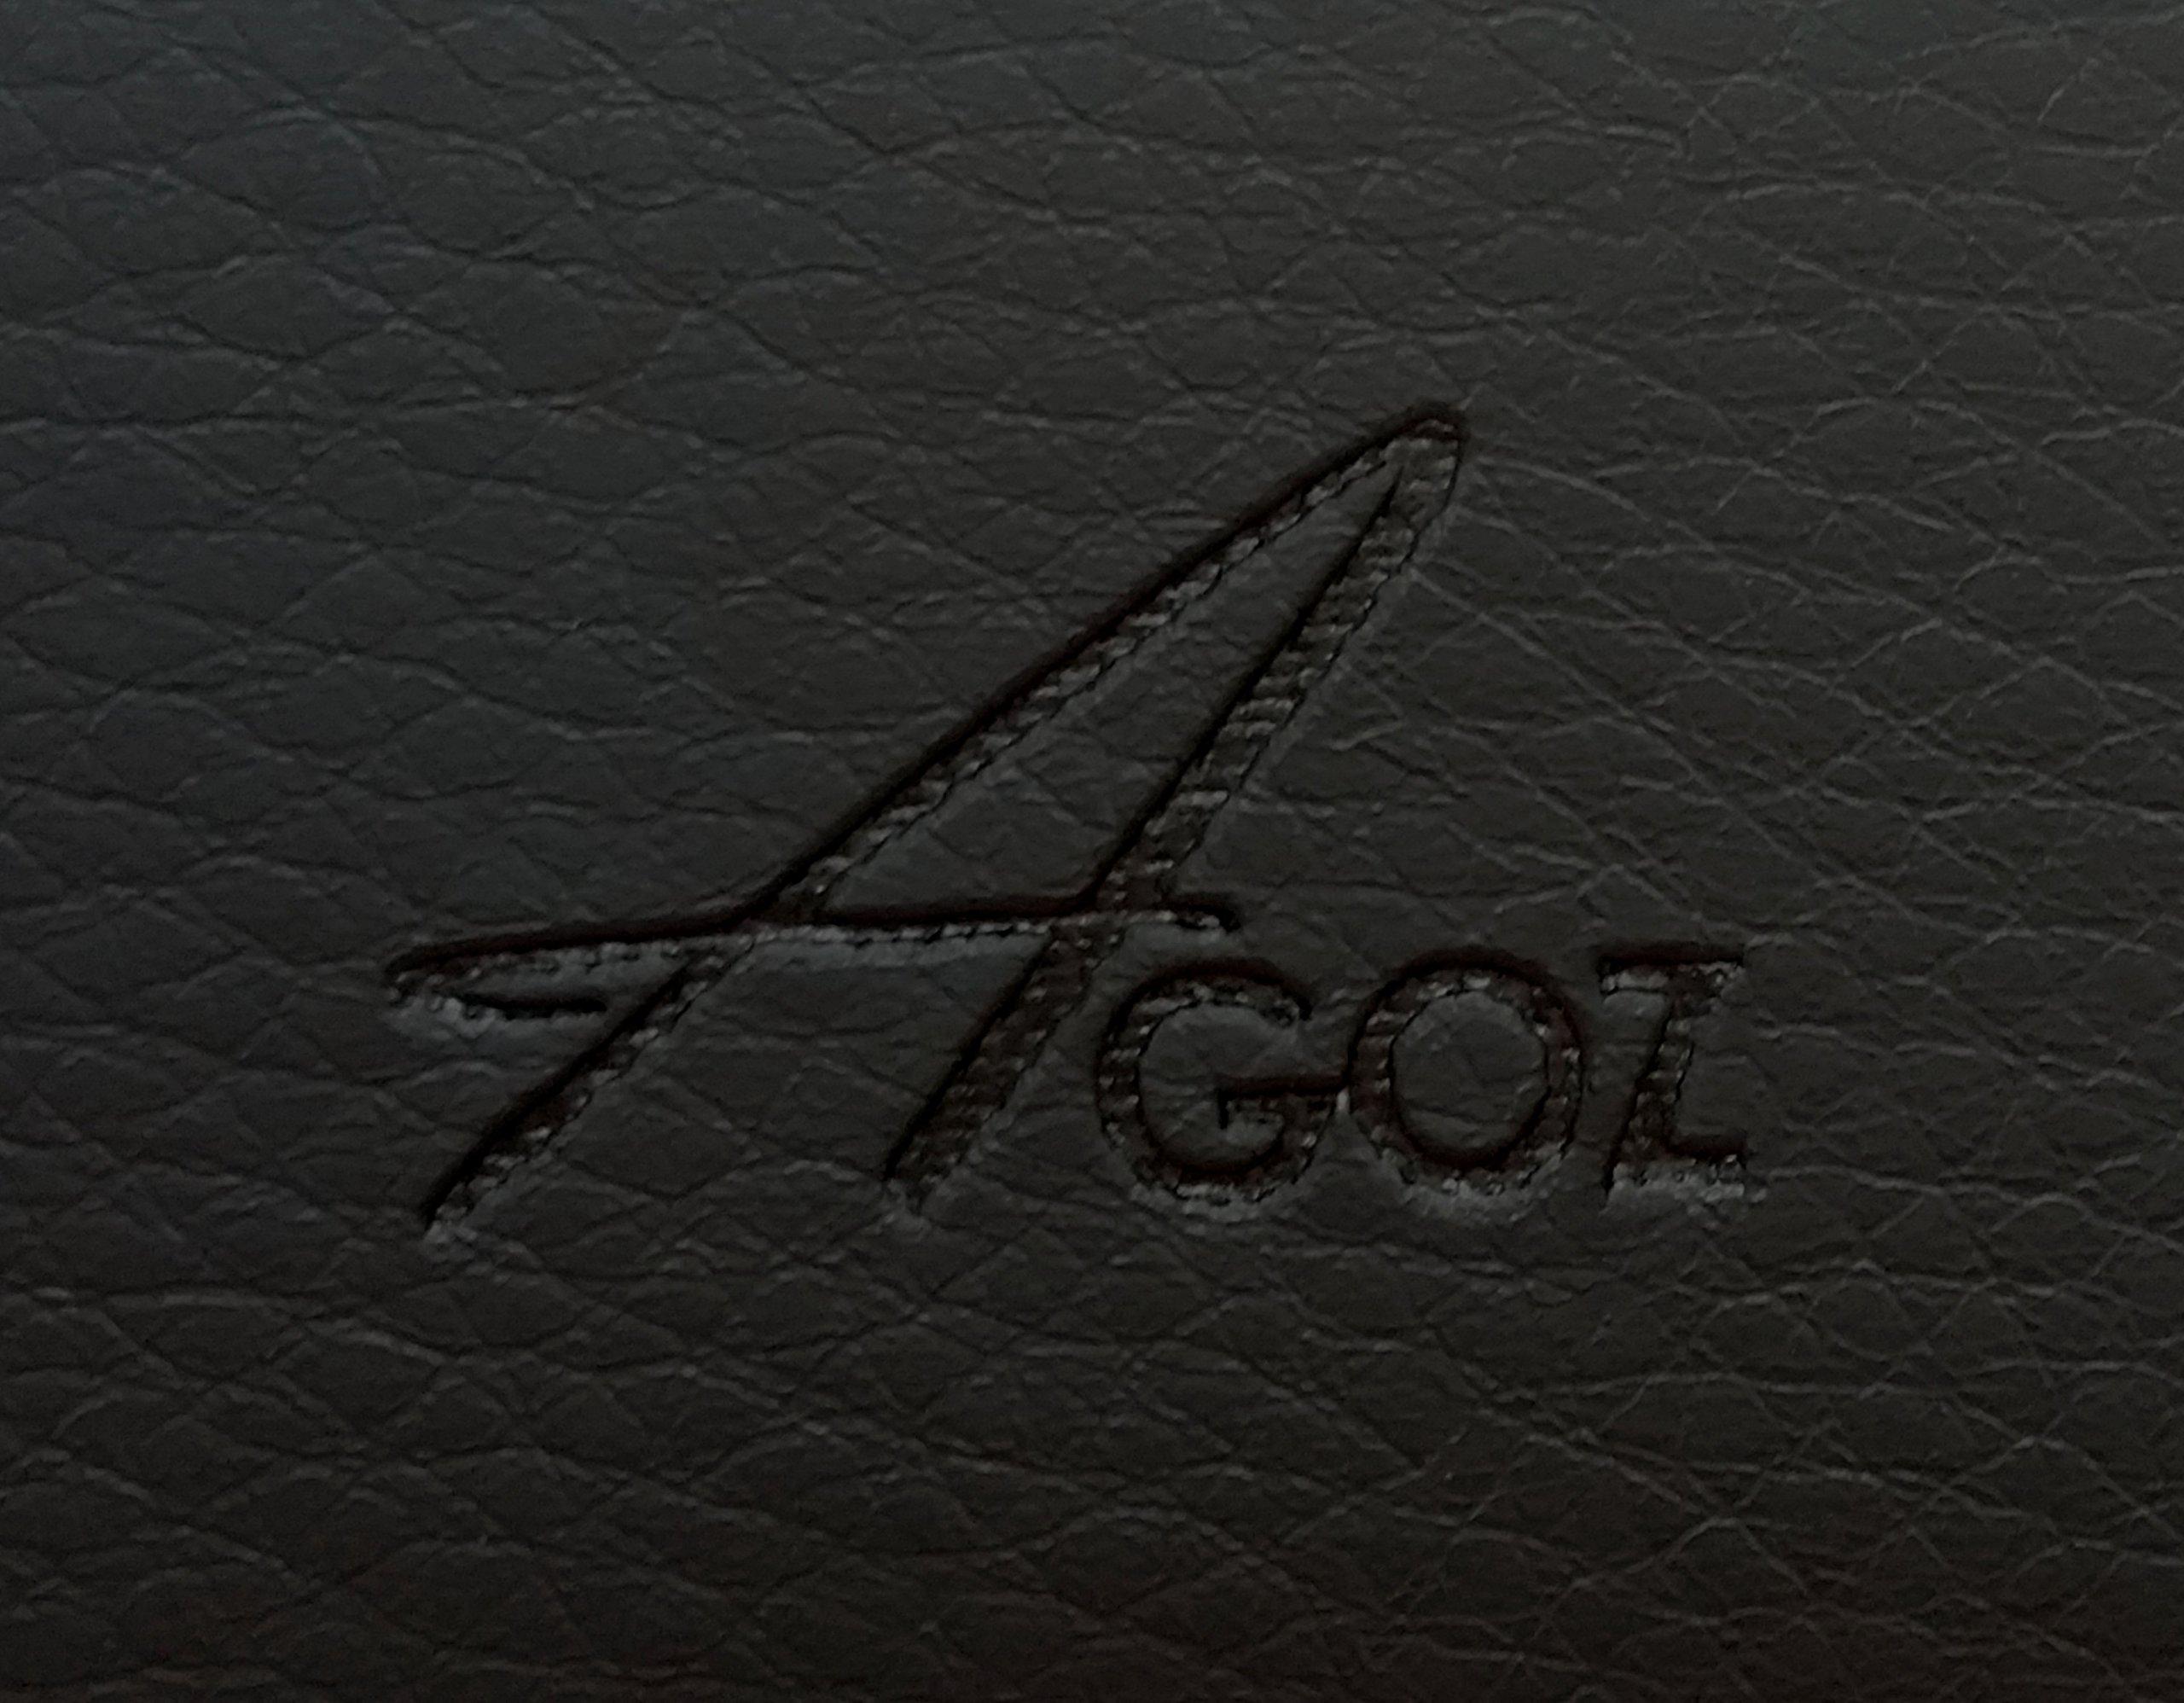 Motorola Moto Z Force Droid Edition, Moto Z Play Droid, Moto Z2 Force, Moto Z2 Play, Z Play (2nd Gen), Moto Z3 Play, Premium Leather AGOZ Pouch Case Holster Belt Clip & Loops